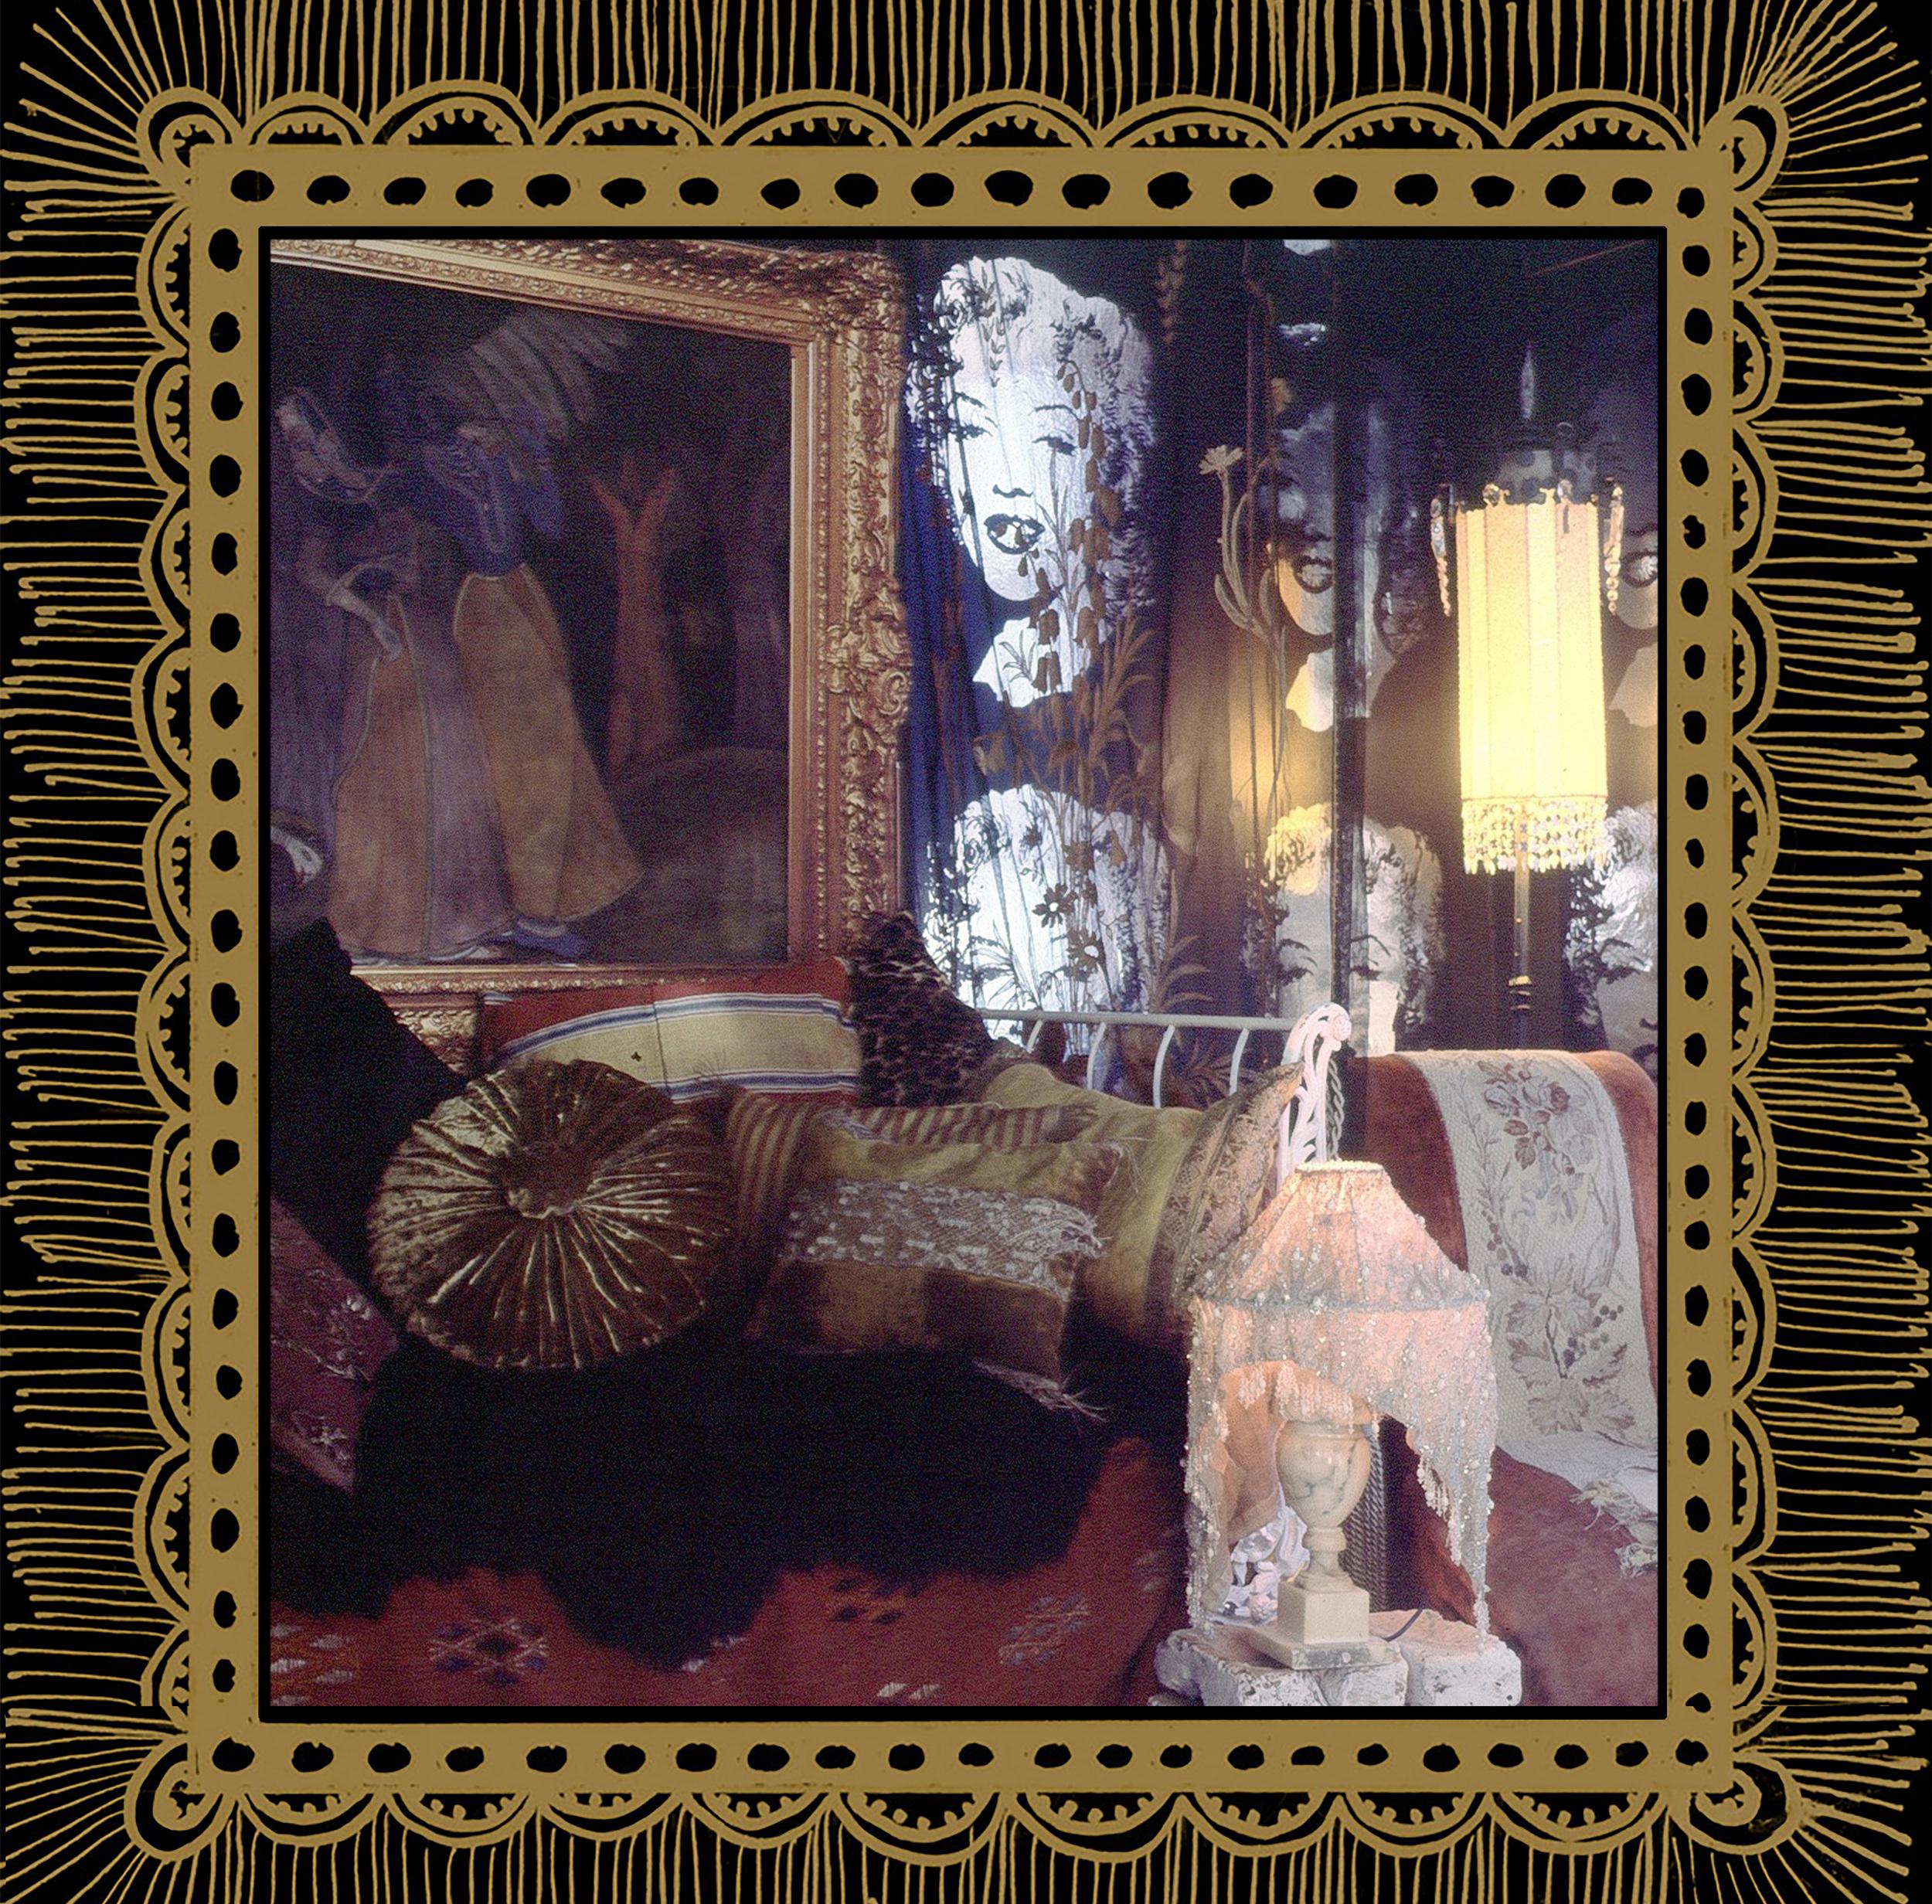 boudoir abf_Untitled-3.jpg